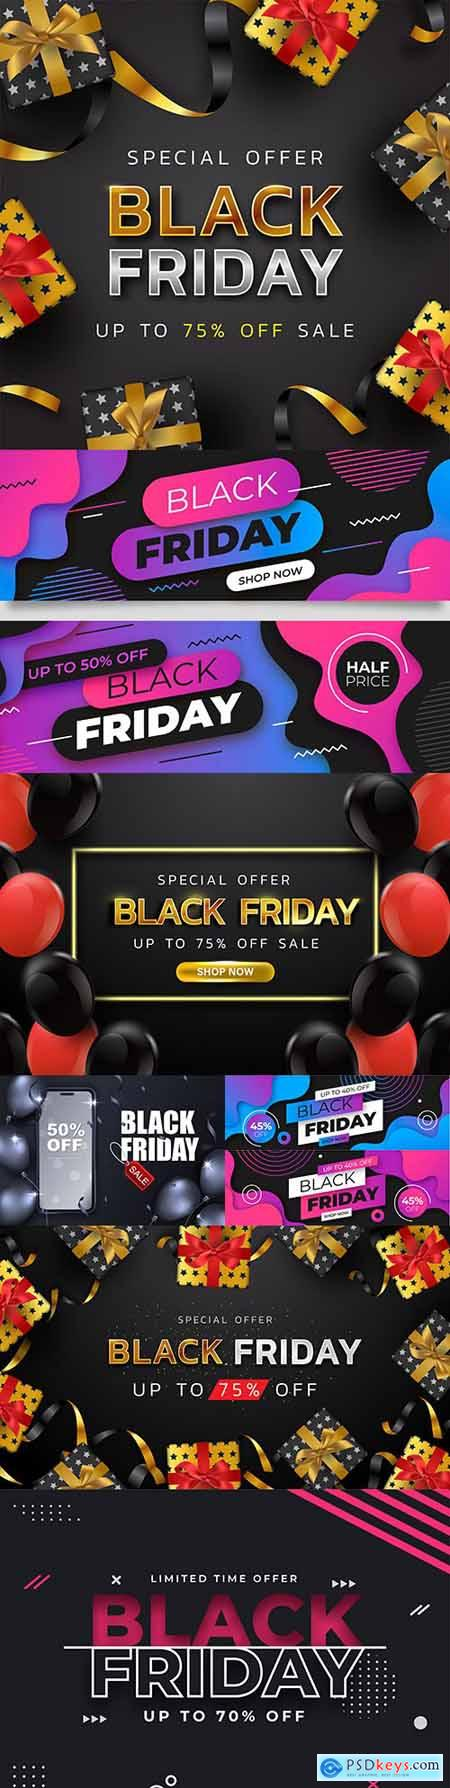 Black Friday and sale special design illustration 37